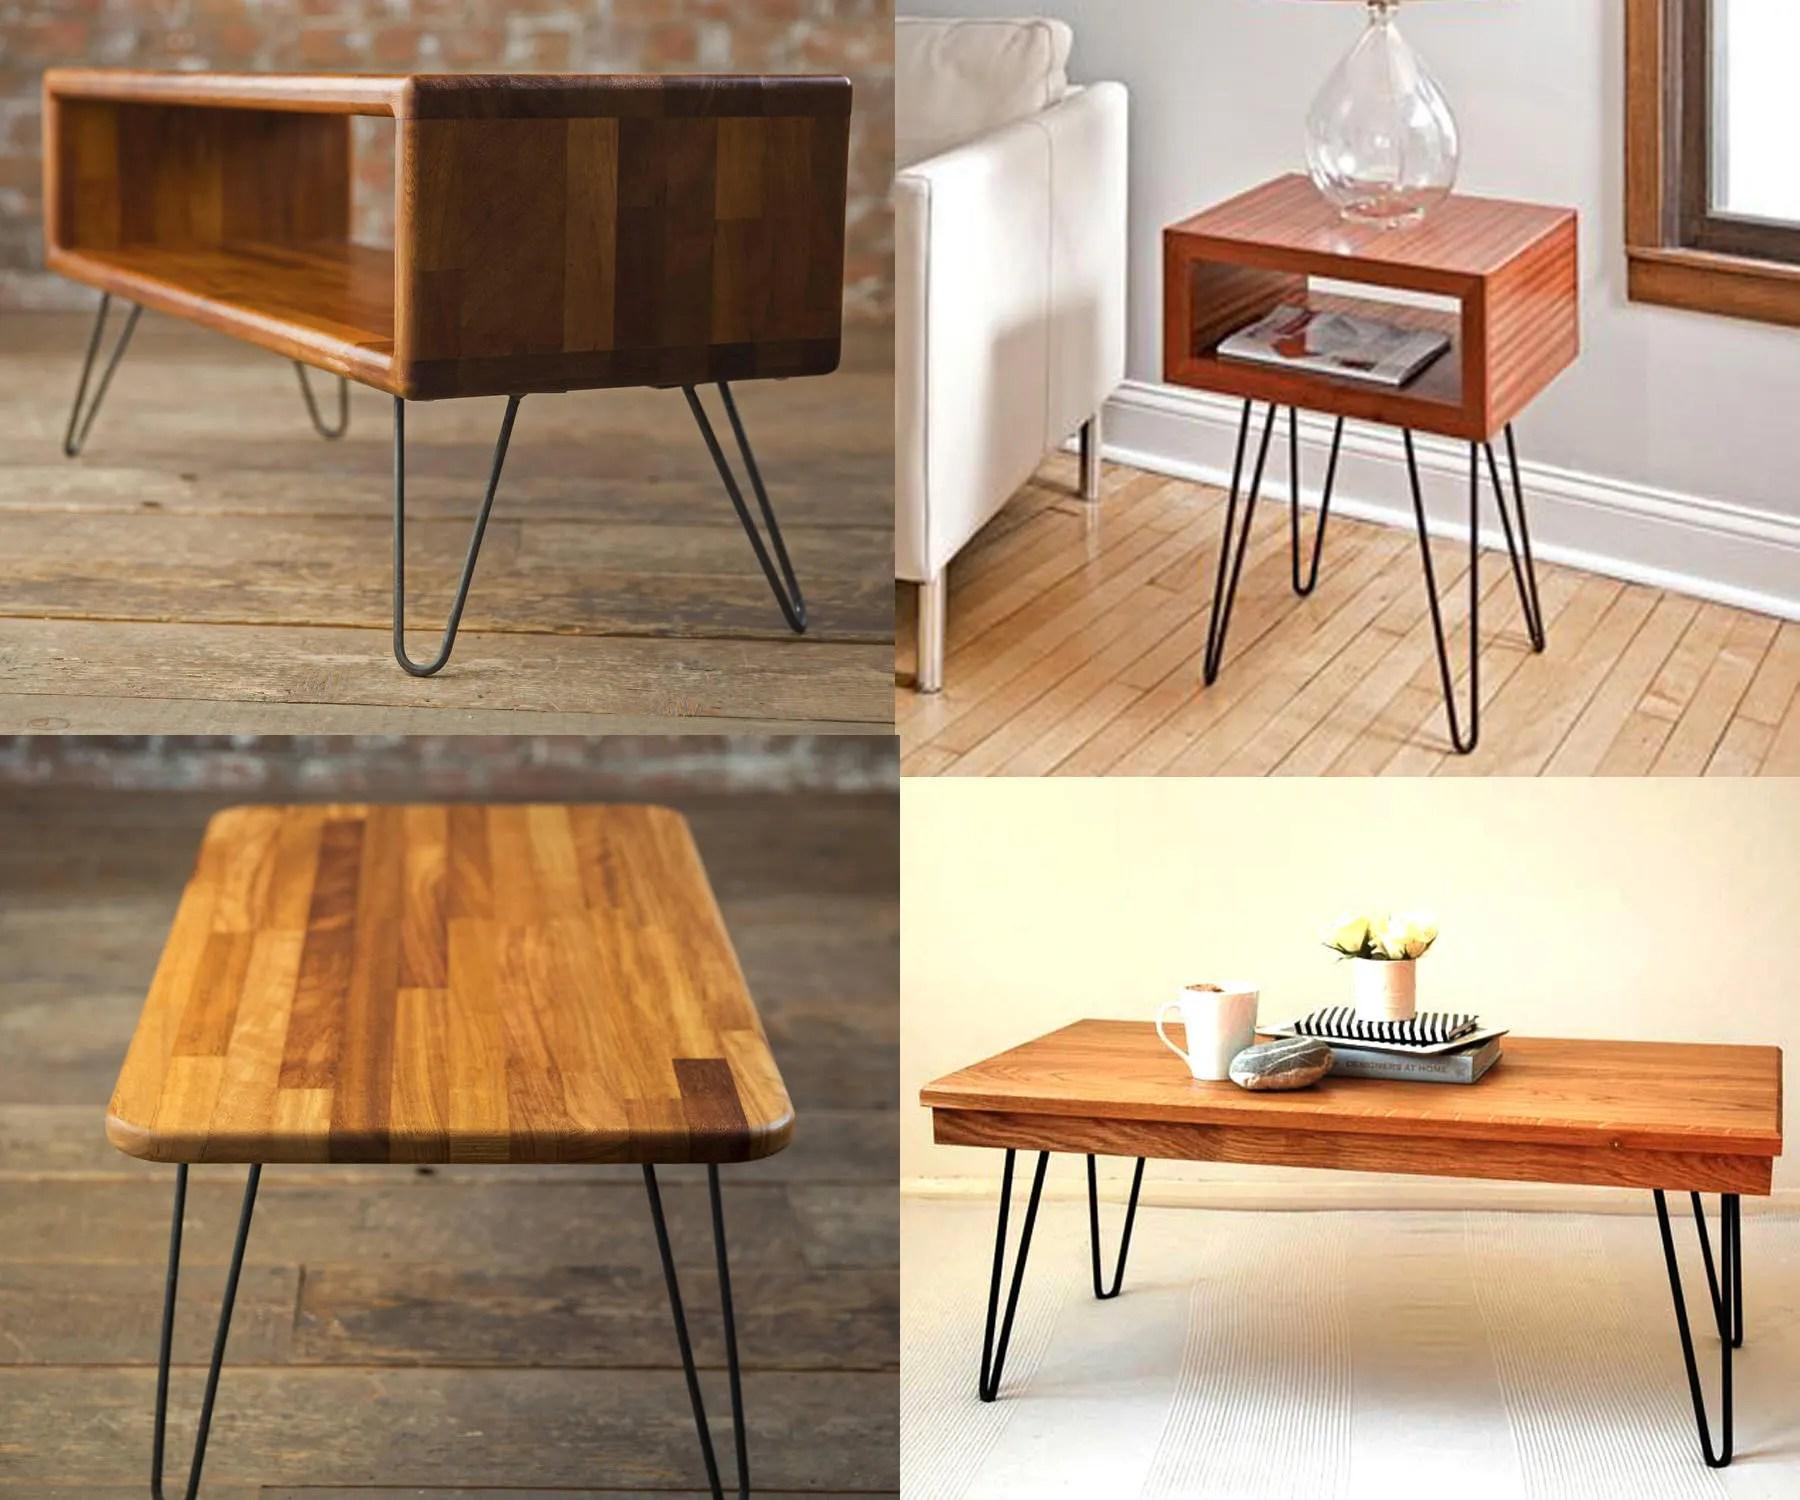 hairpin legs matte black diy industrial strength mid century modern table legs set of 4